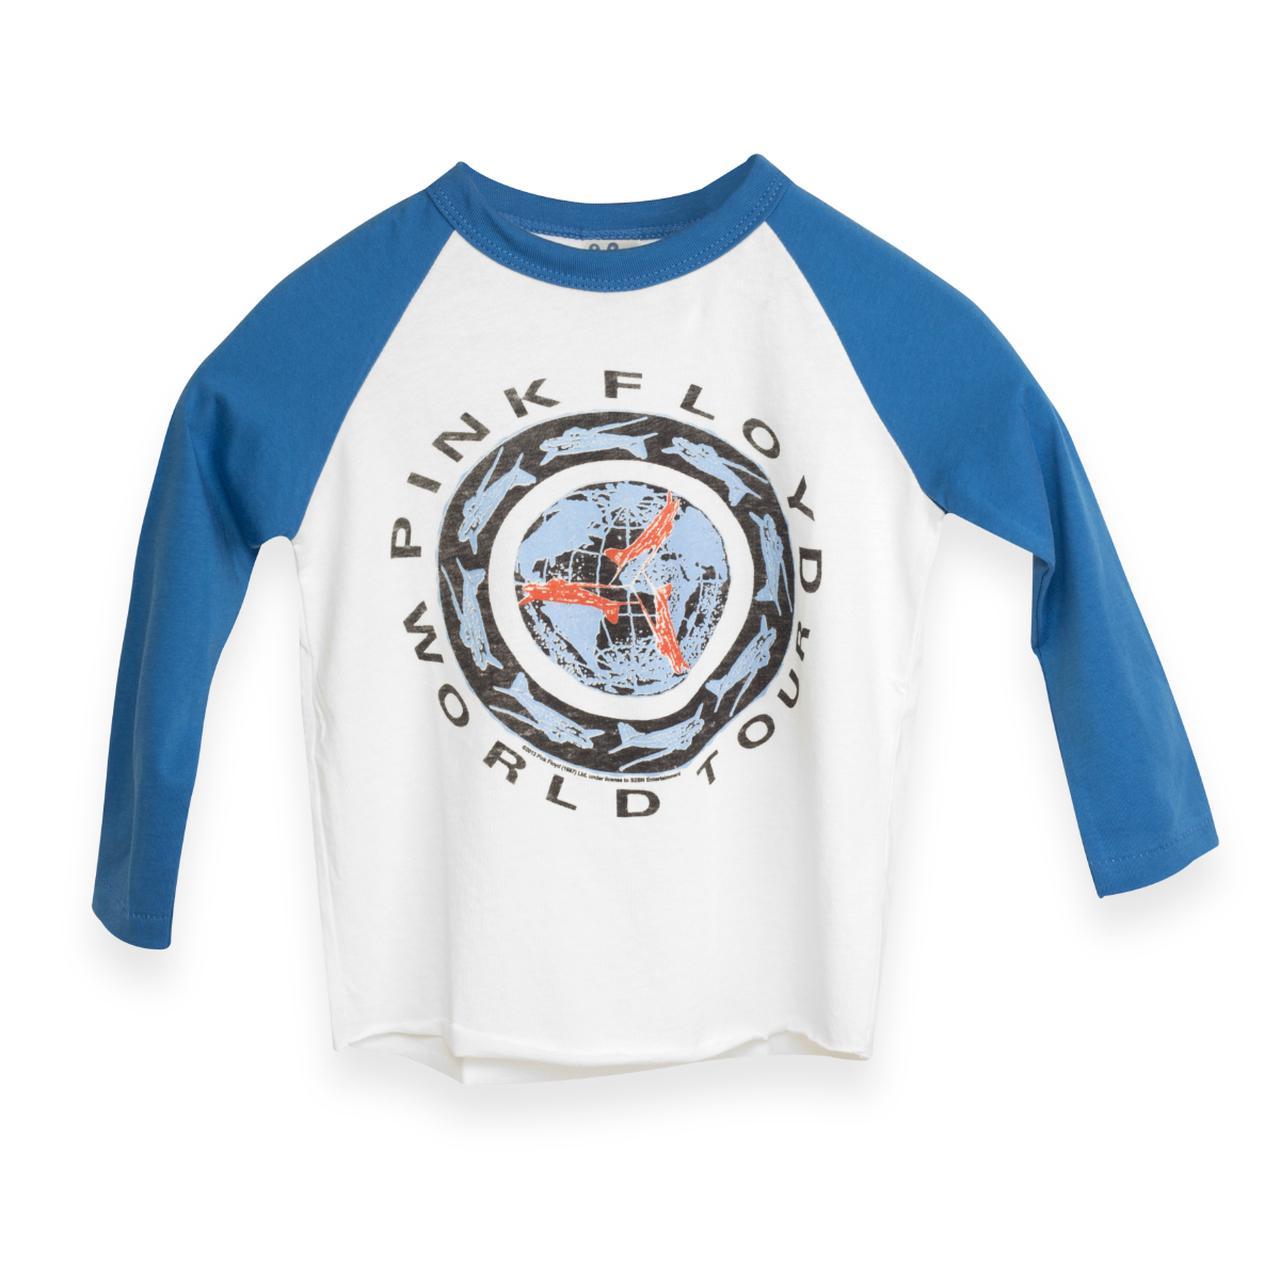 Pink Floyd Kids World Tour Globe Raglan T-Shirt 6b93094616